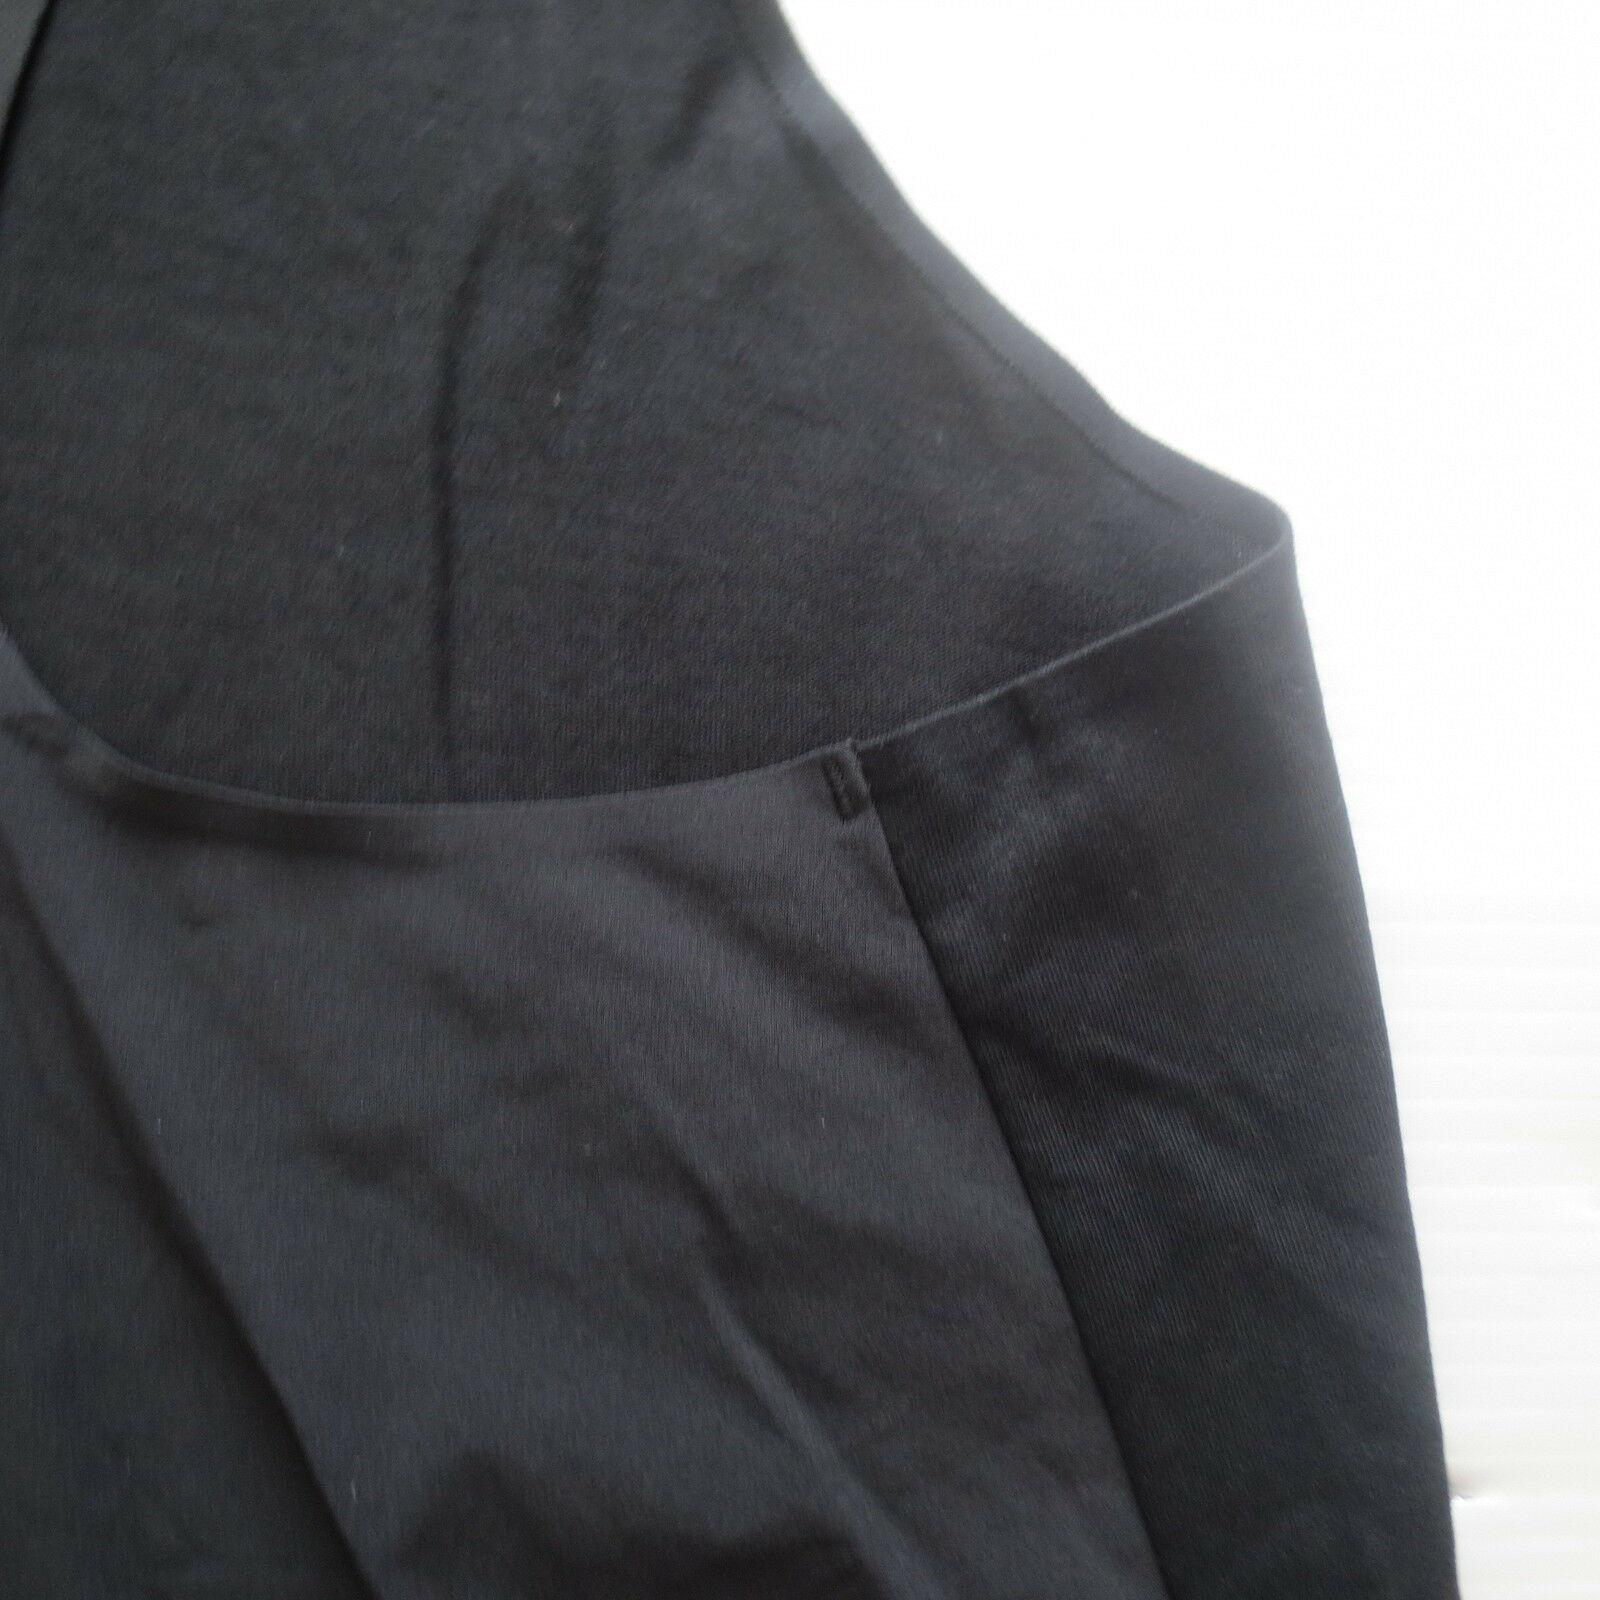 Nike Women Breathe Tank Top Shirt - 862774 - Black 010 - Size L - NWT image 8